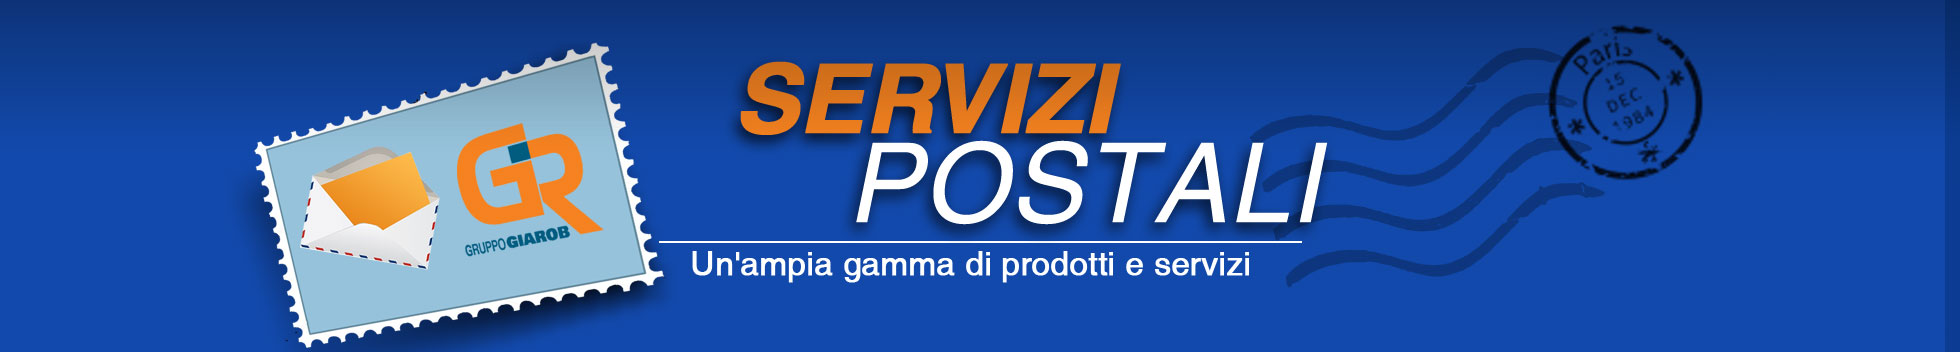 Gruppo Poste Giarob - Servizi postali